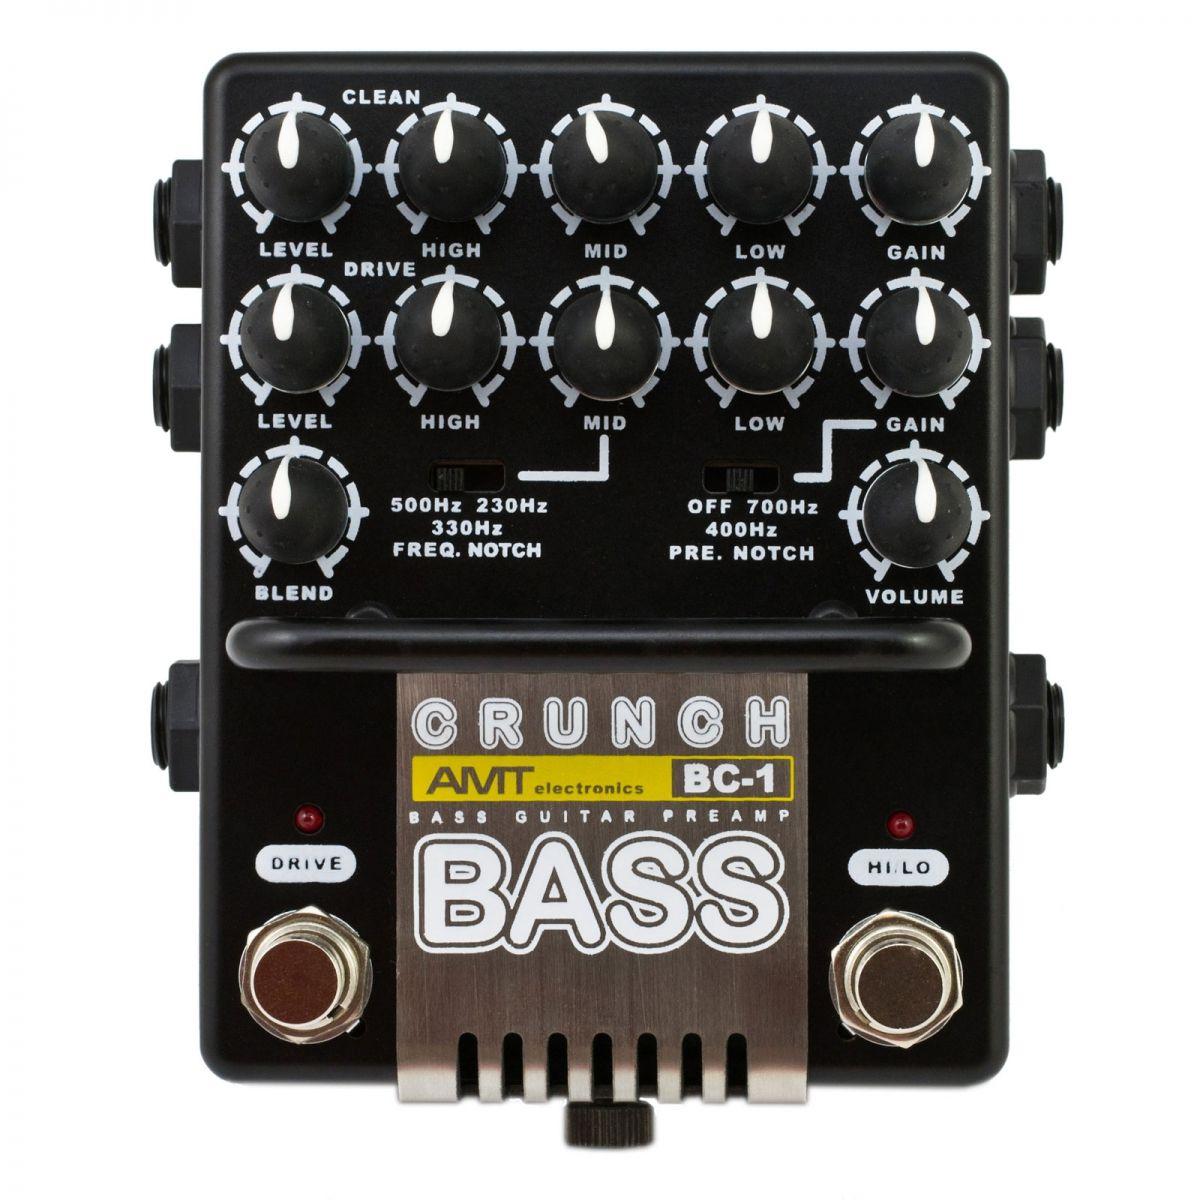 Amt Electronics Bc 1 Bass Crunch 2 Channel Jfet Bass Guitar Preamp